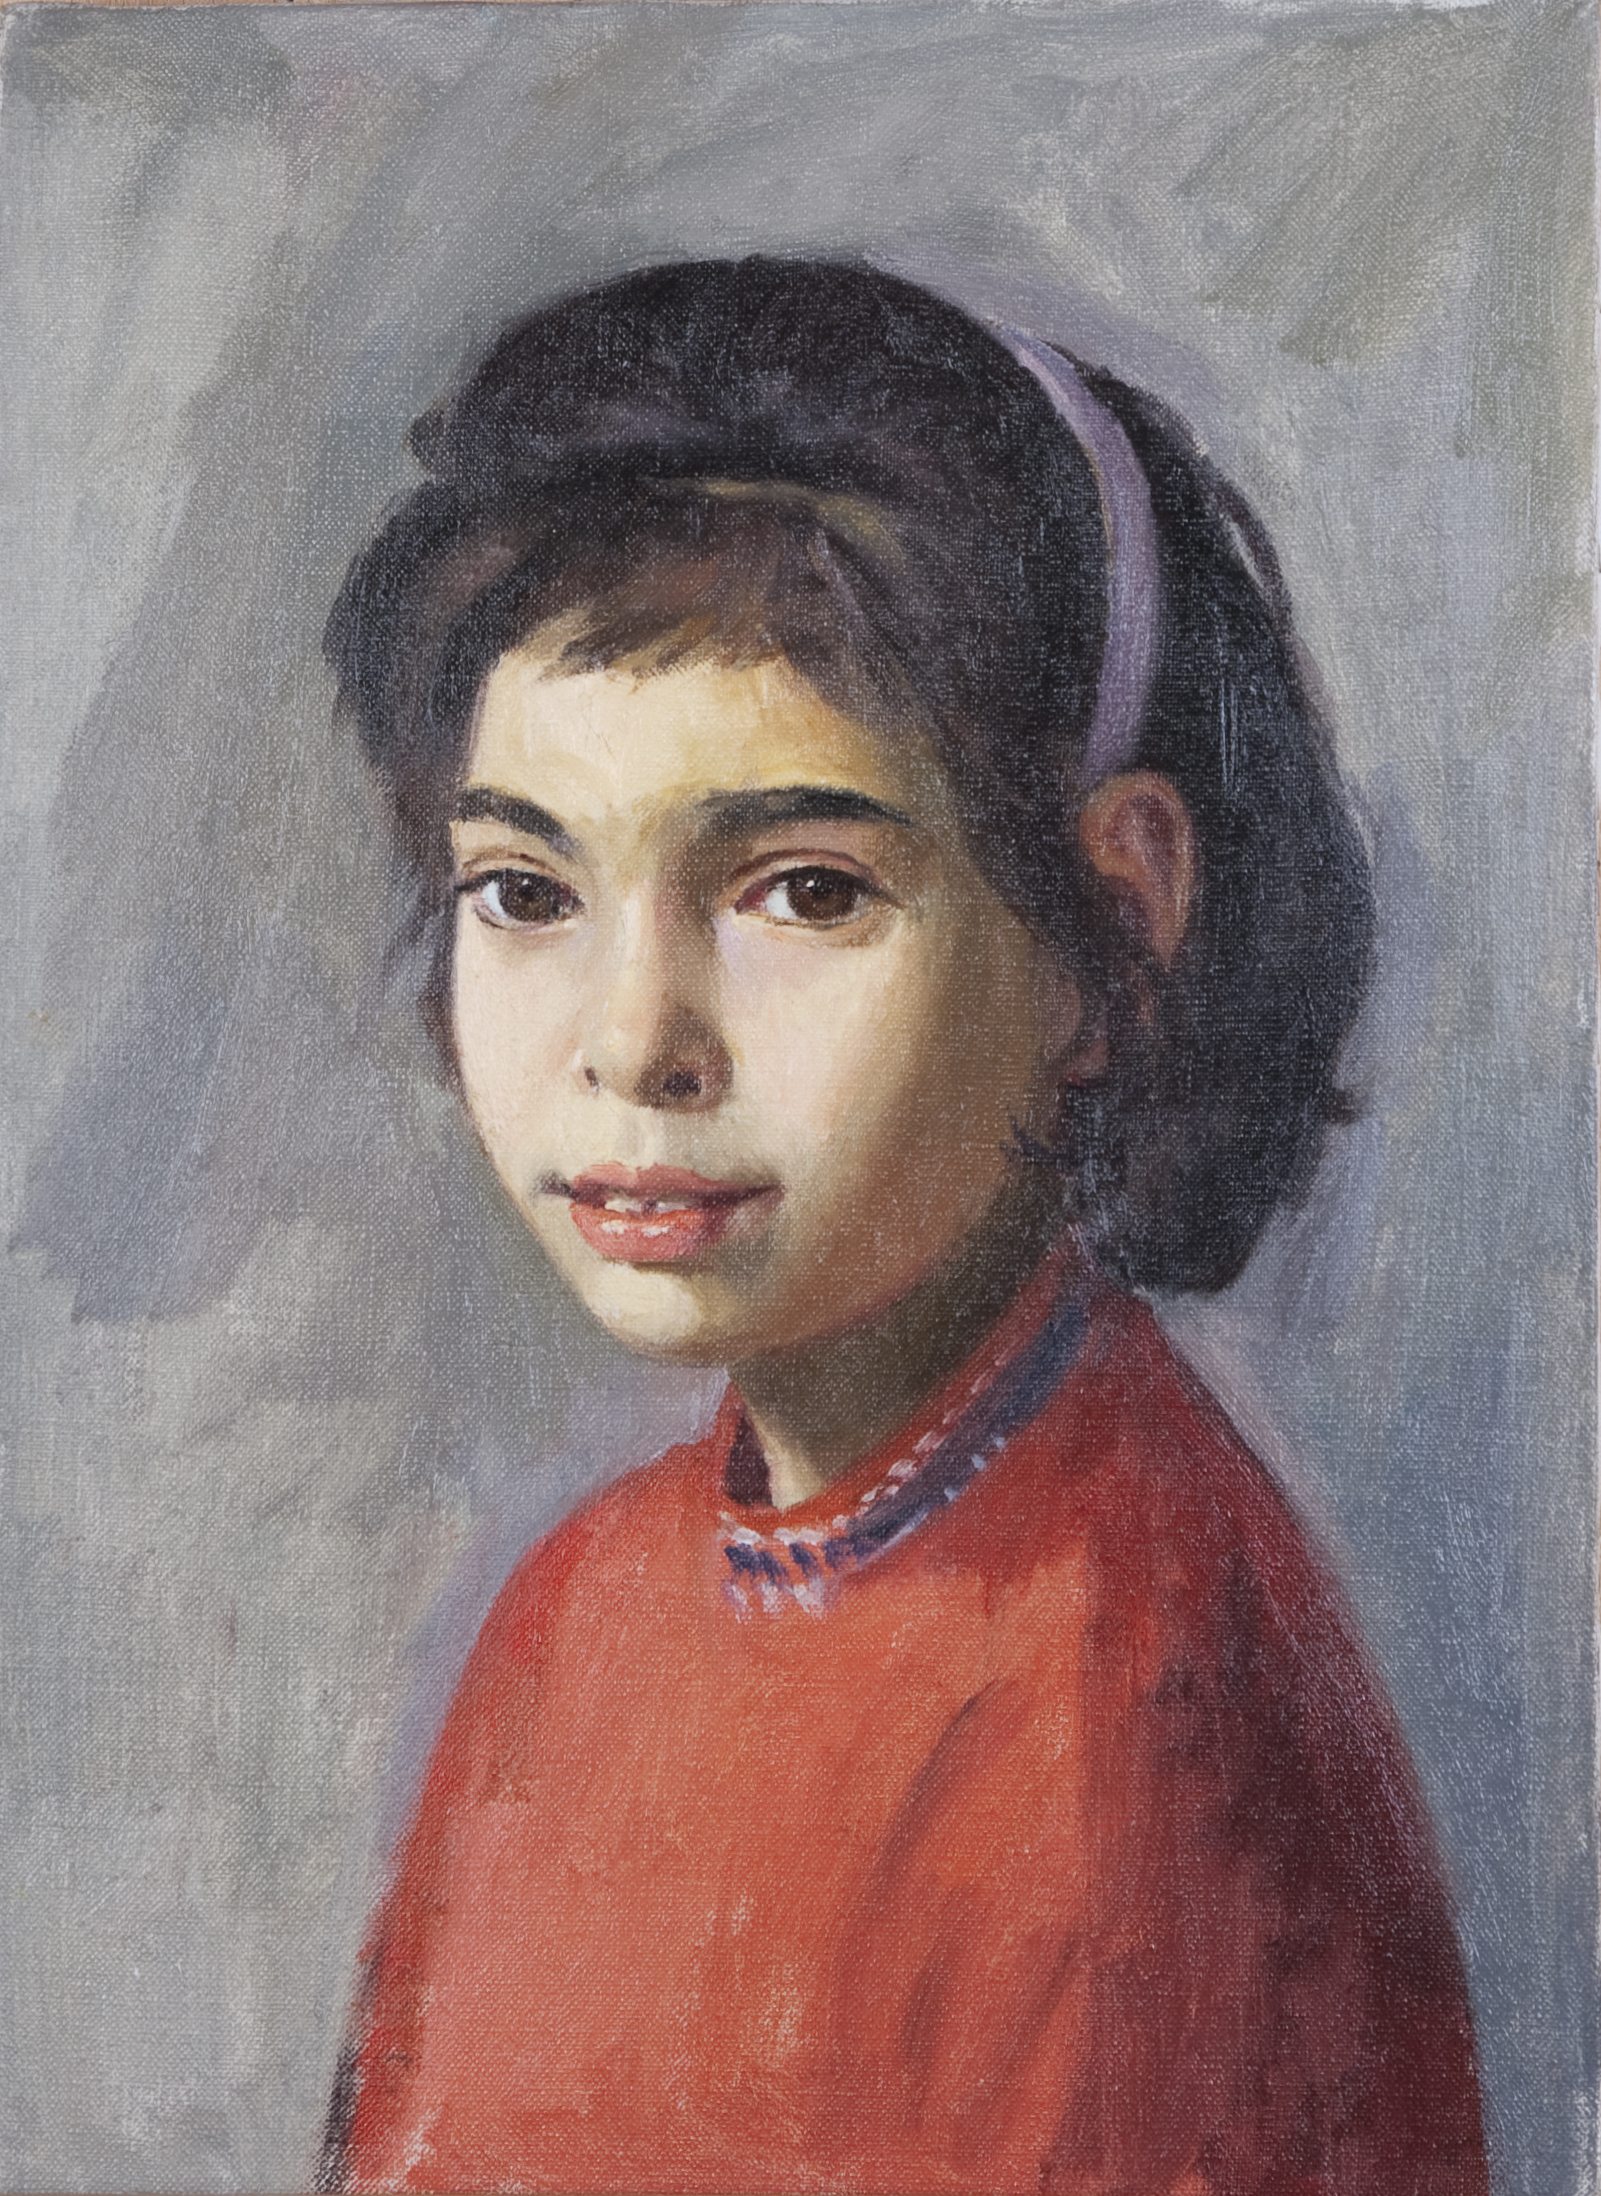 098 Janie 1960 - Oil on Canvas - 10 x 14.25 - No Frame